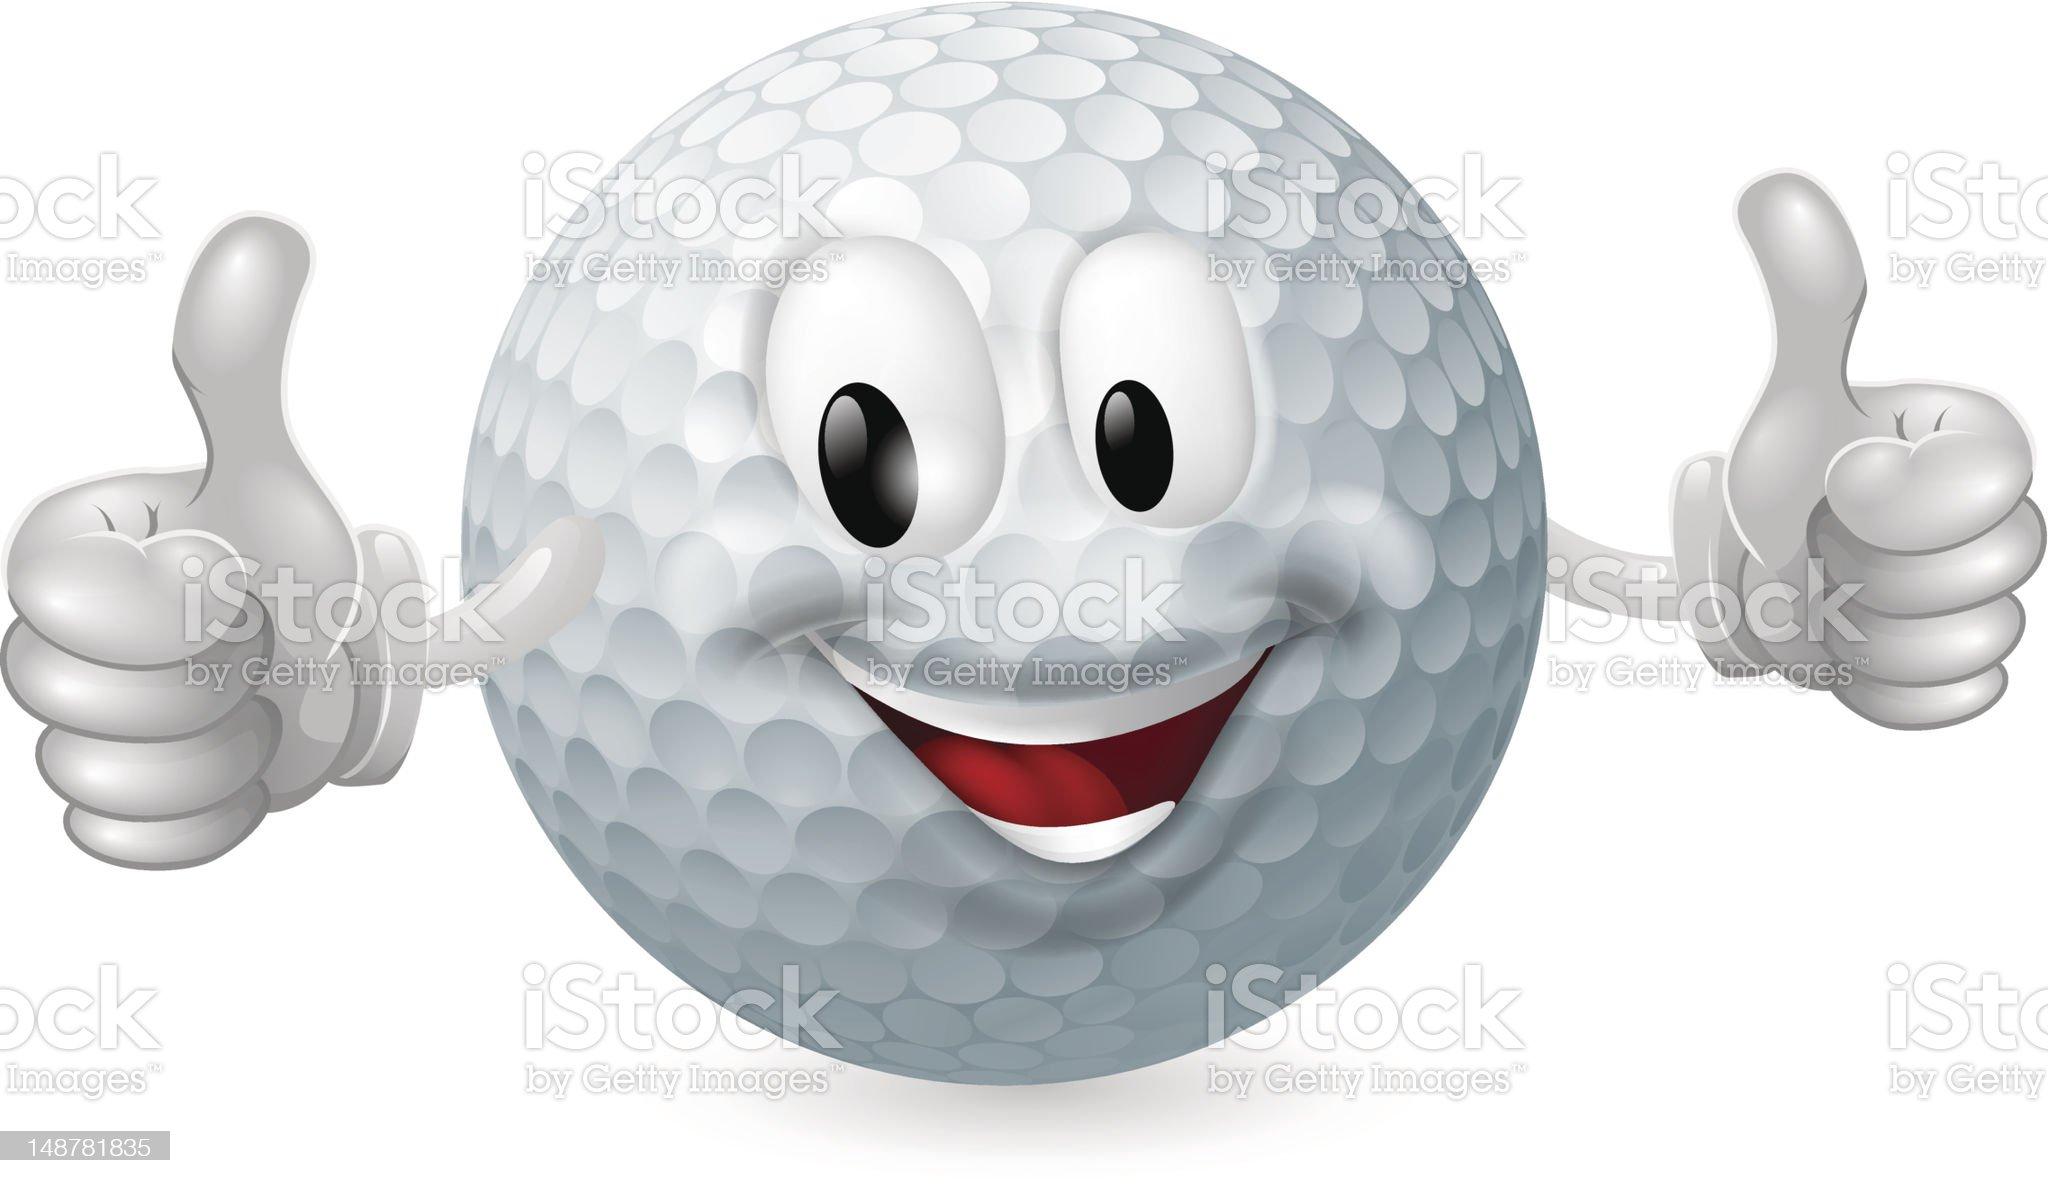 Golf Ball Mascot royalty-free golf ball mascot stock vector art & more images of golf ball